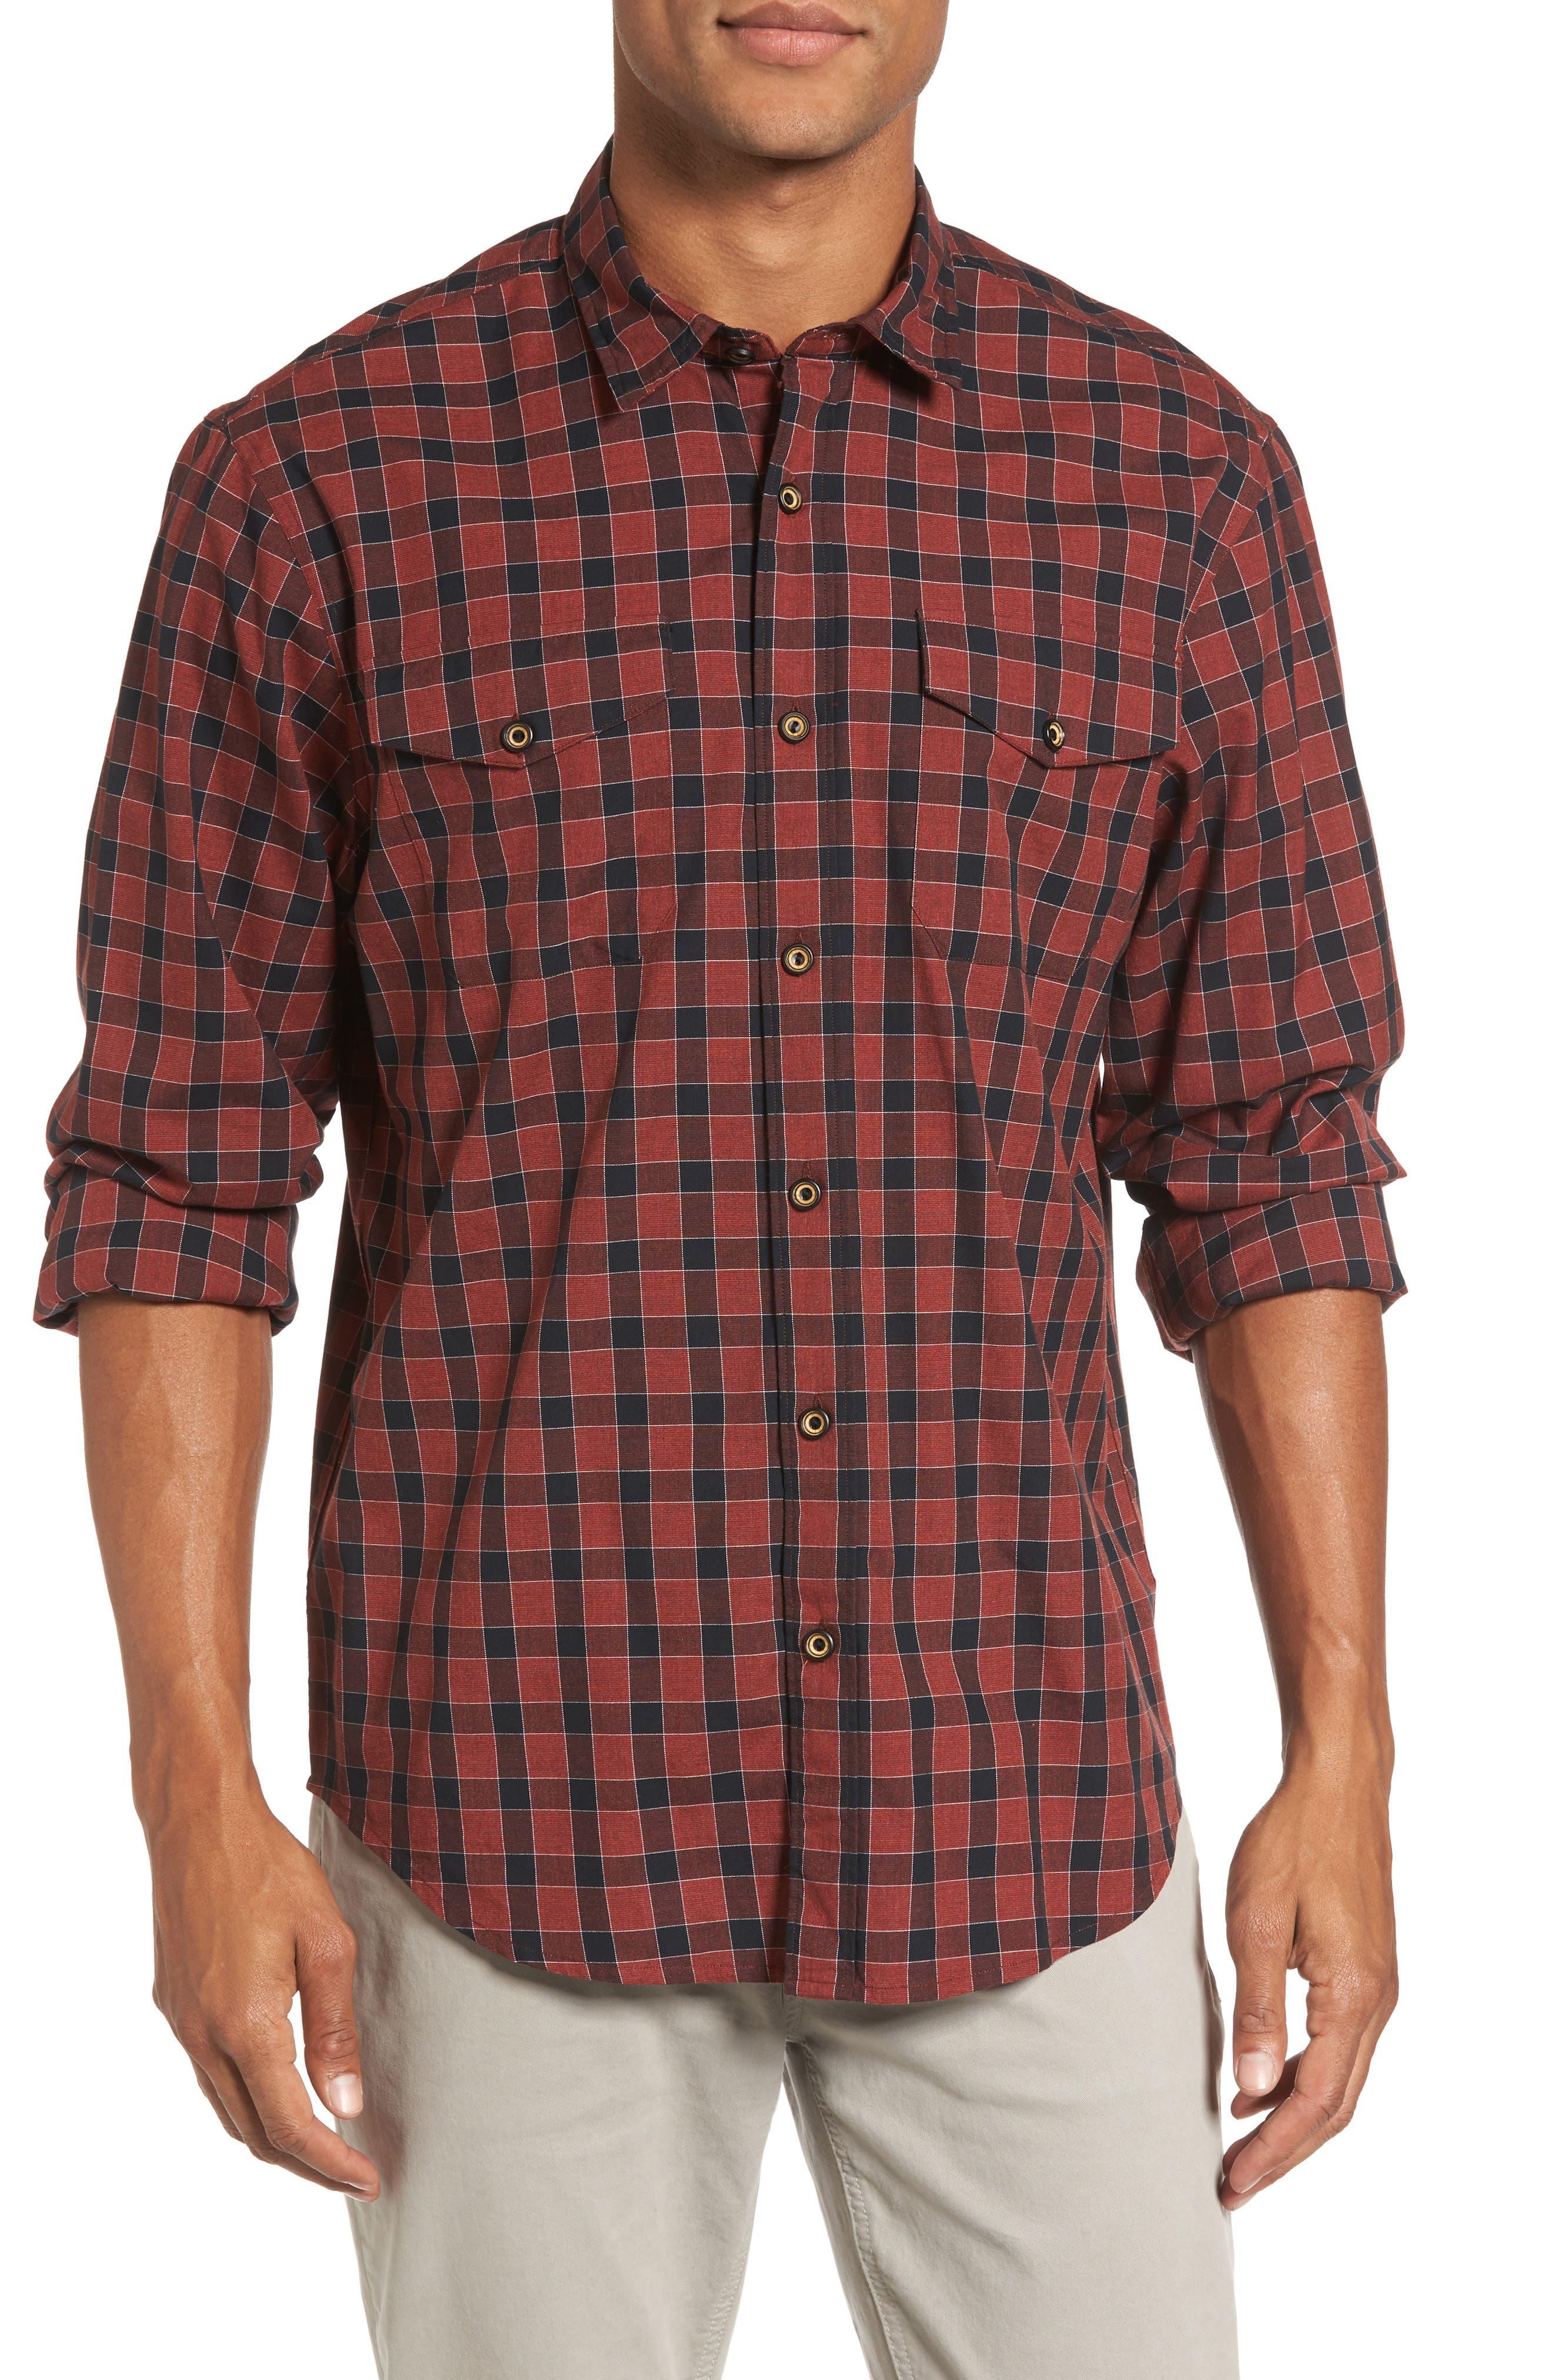 Lake Plaid Flannel Shirt,                         Main,                         color, 600